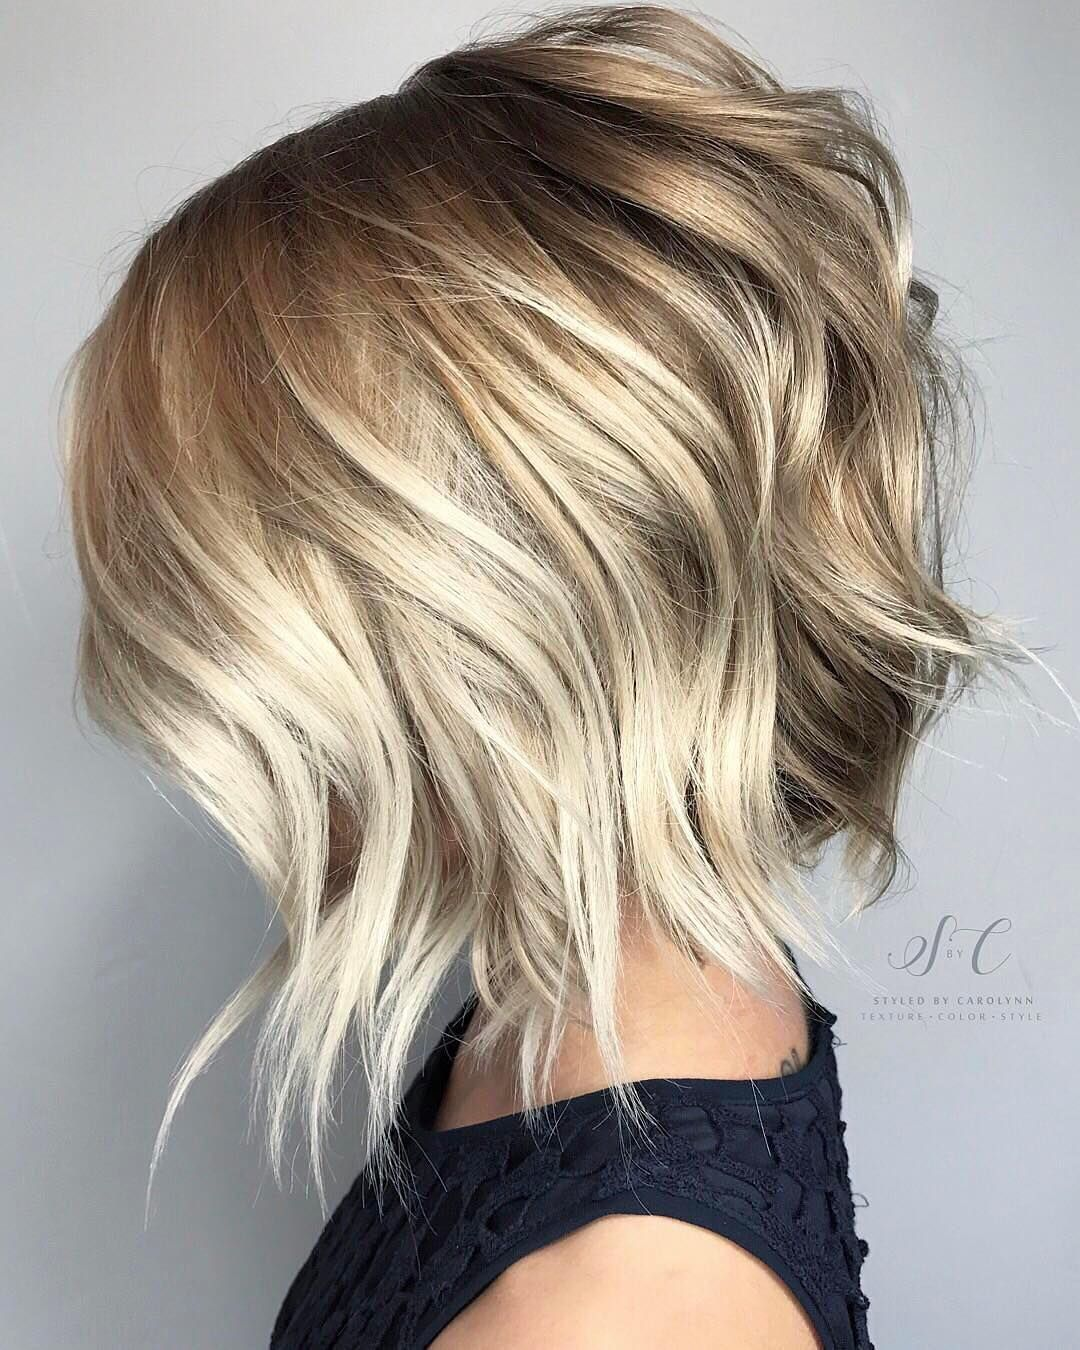 Pin by monica rector on hair dos in pinterest hair hair